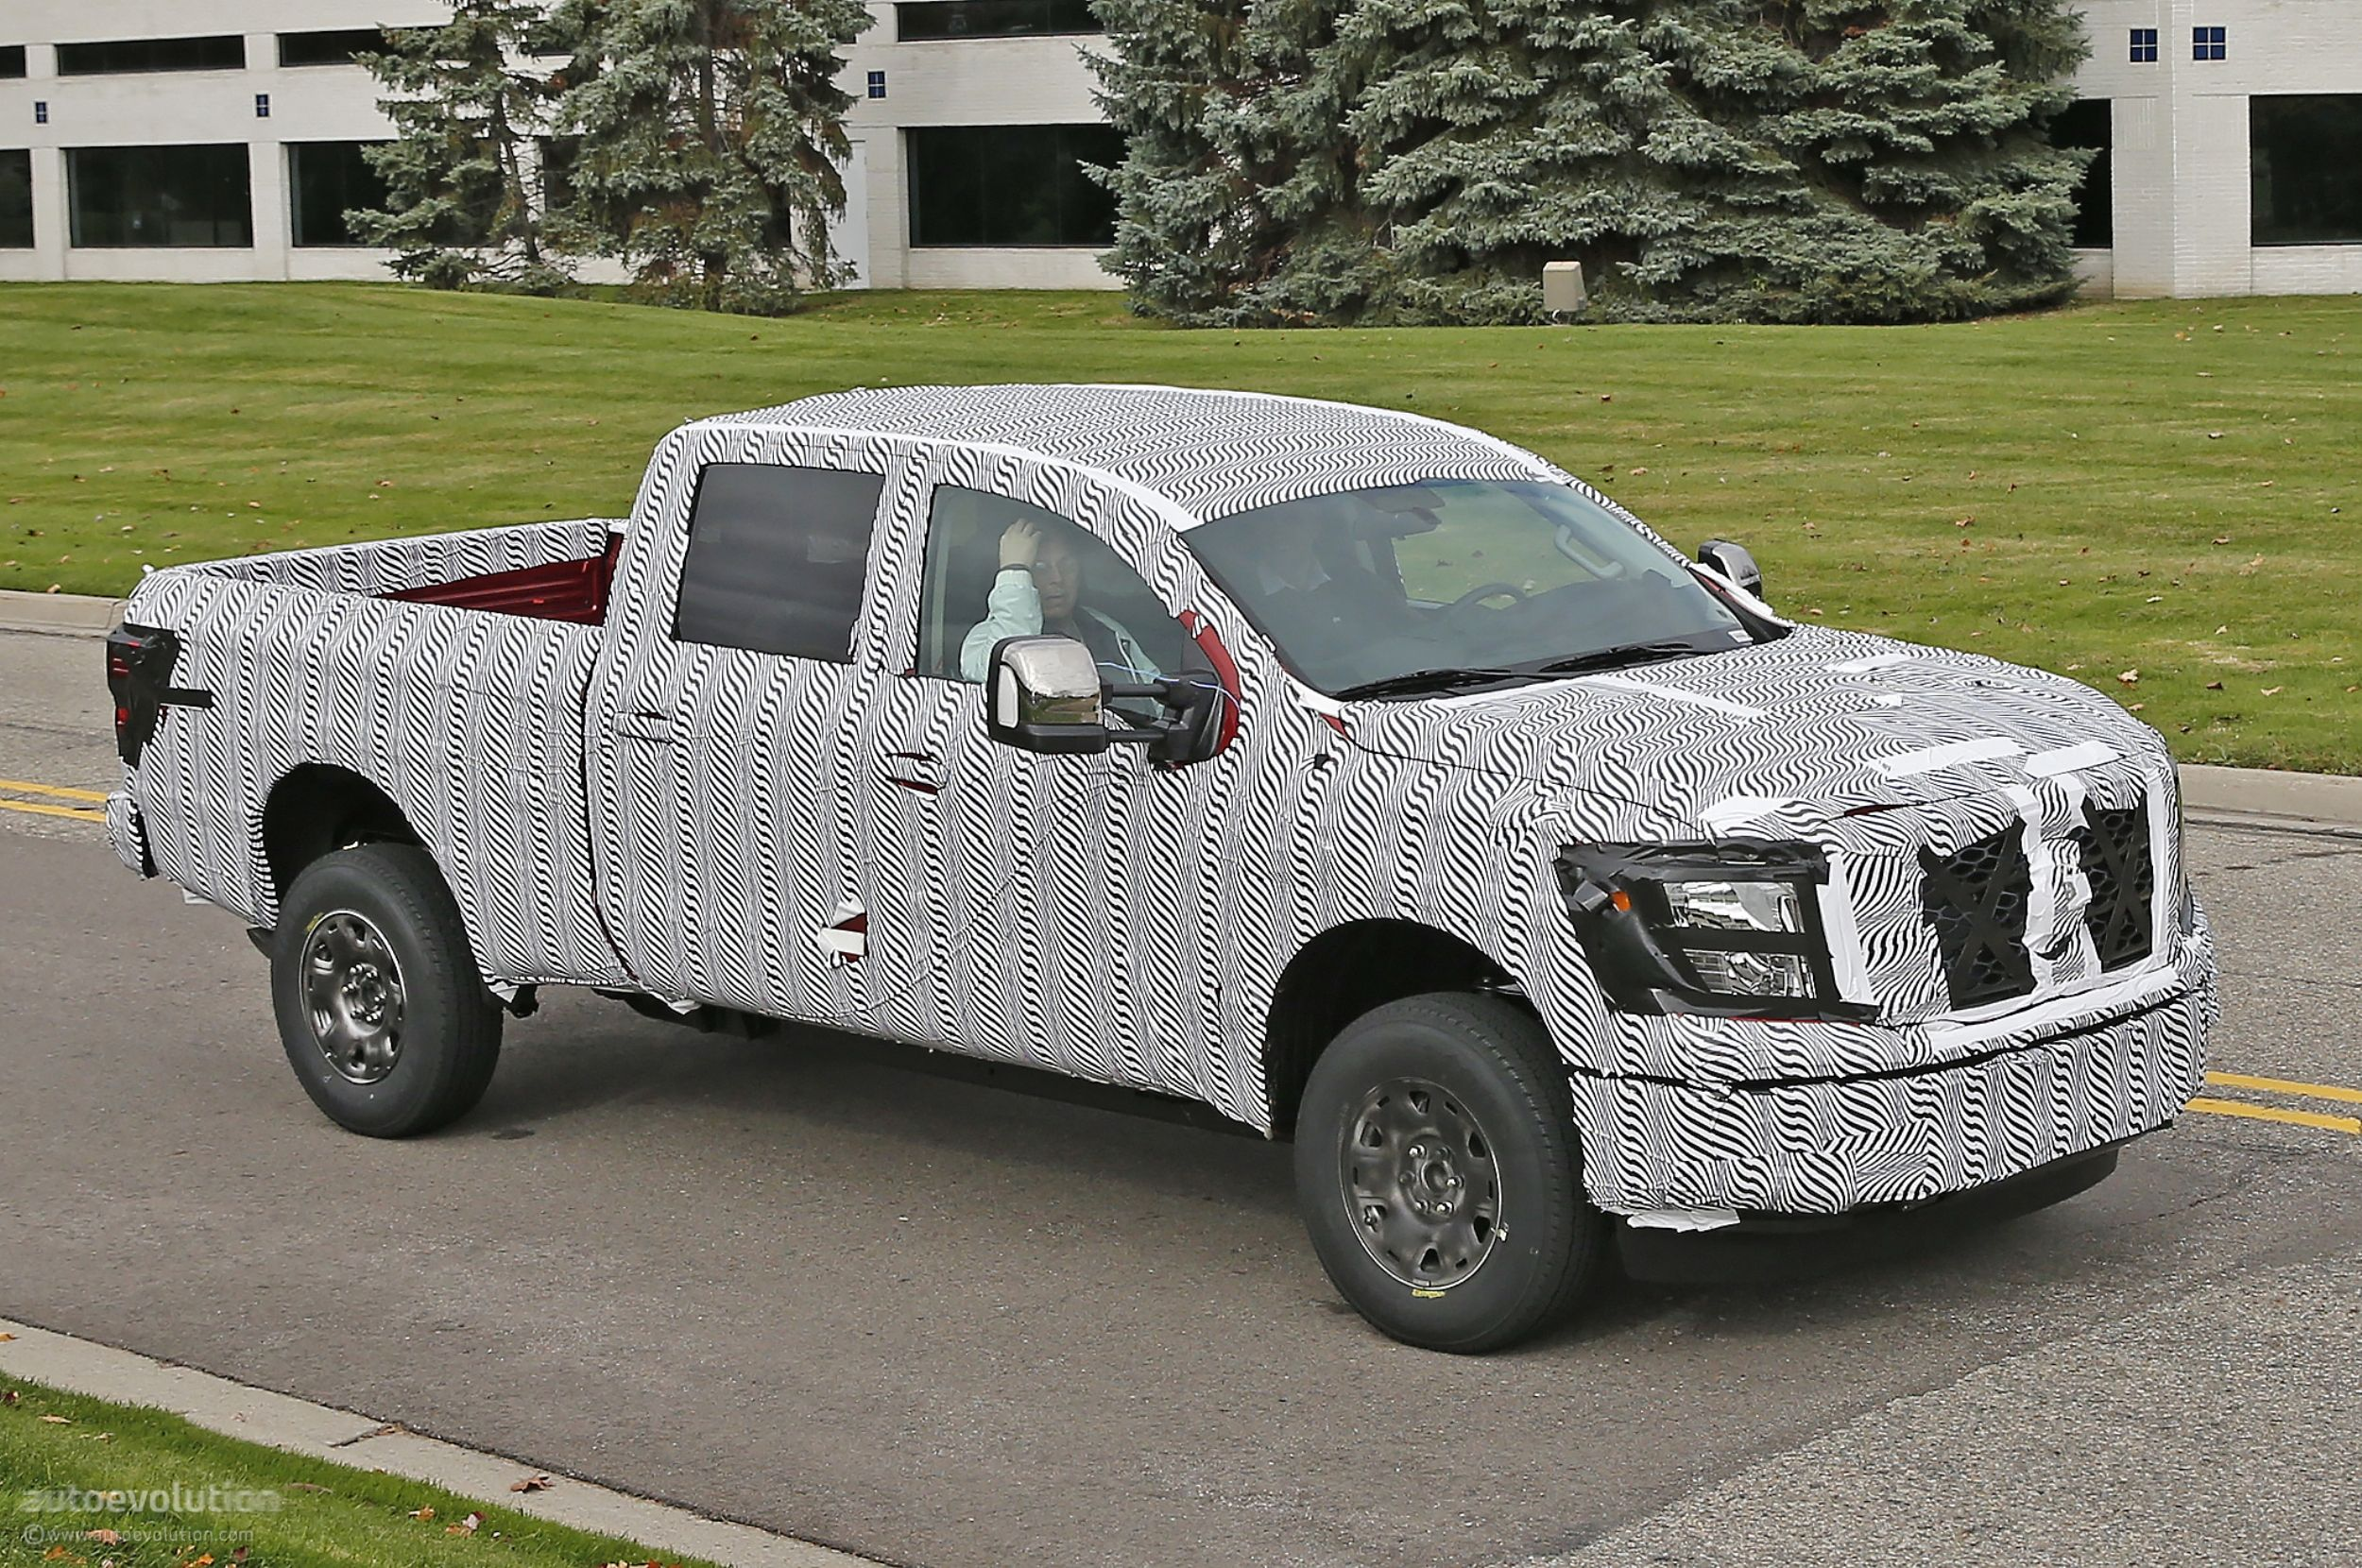 2016 nissan titan spied testing isv cummins turbo diesel autoevolution. Black Bedroom Furniture Sets. Home Design Ideas